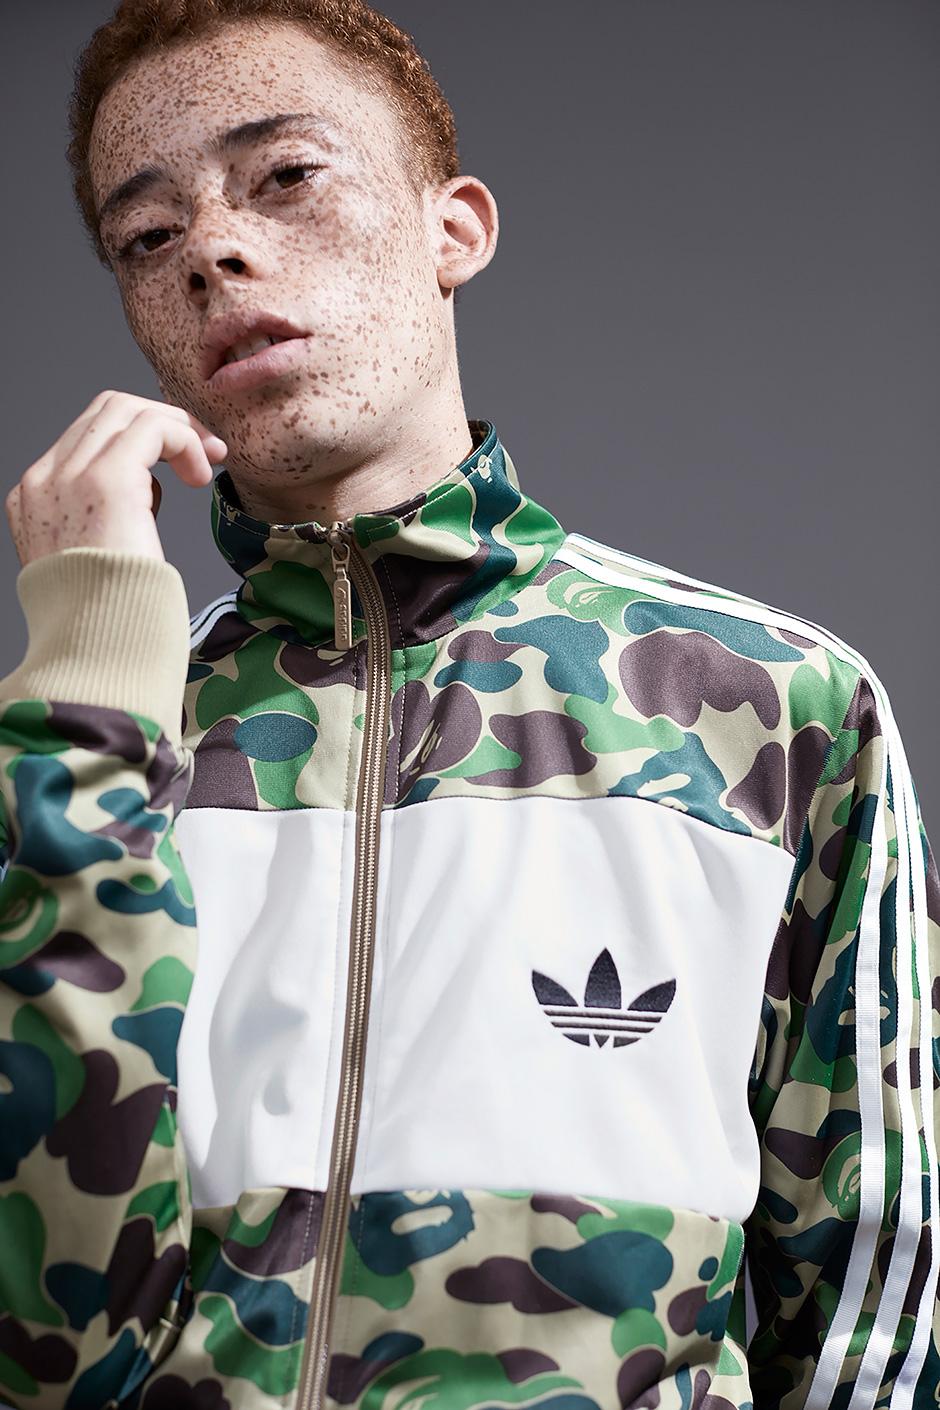 Camo Adidas Jacket